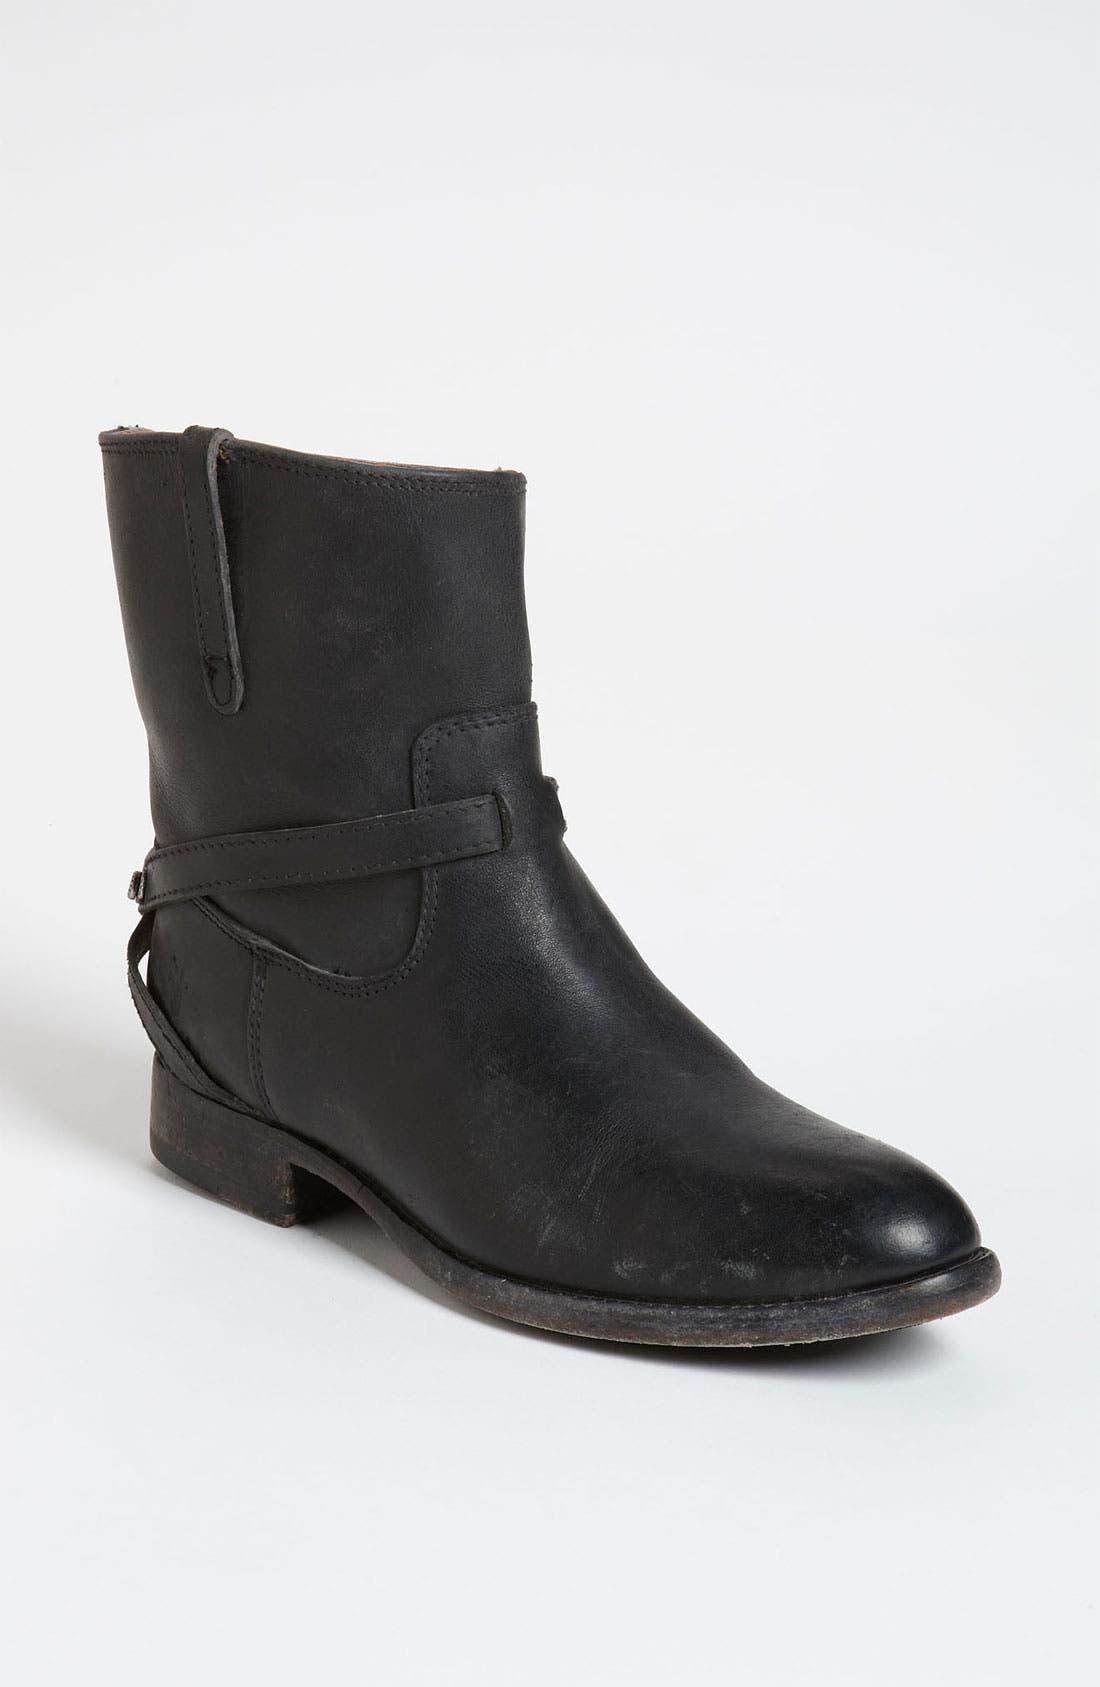 Main Image - Frye 'Lindsay Plate' Short Boot